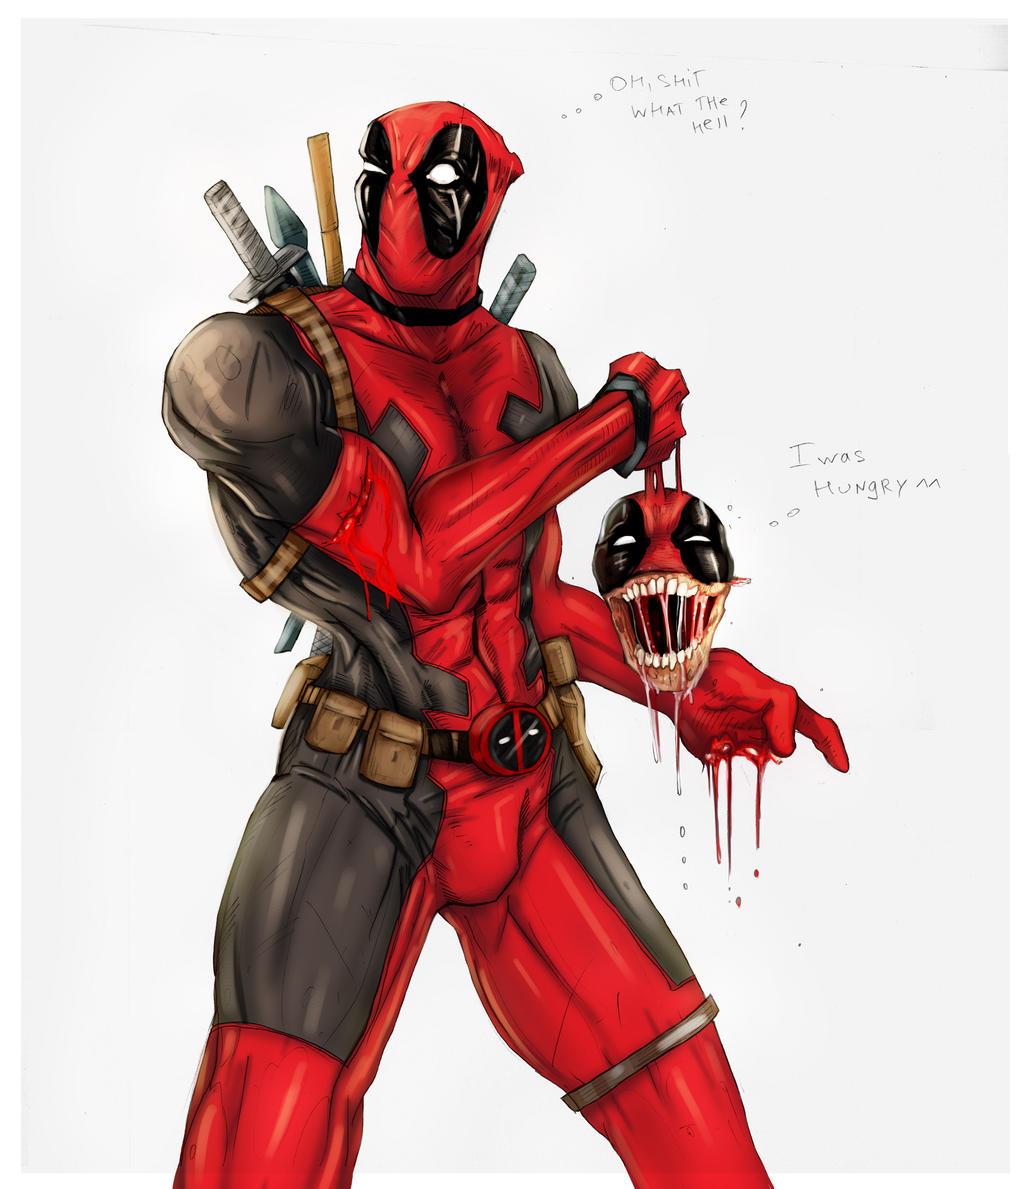 Deadpool and headpool by suspension99 on deviantart for Headpool